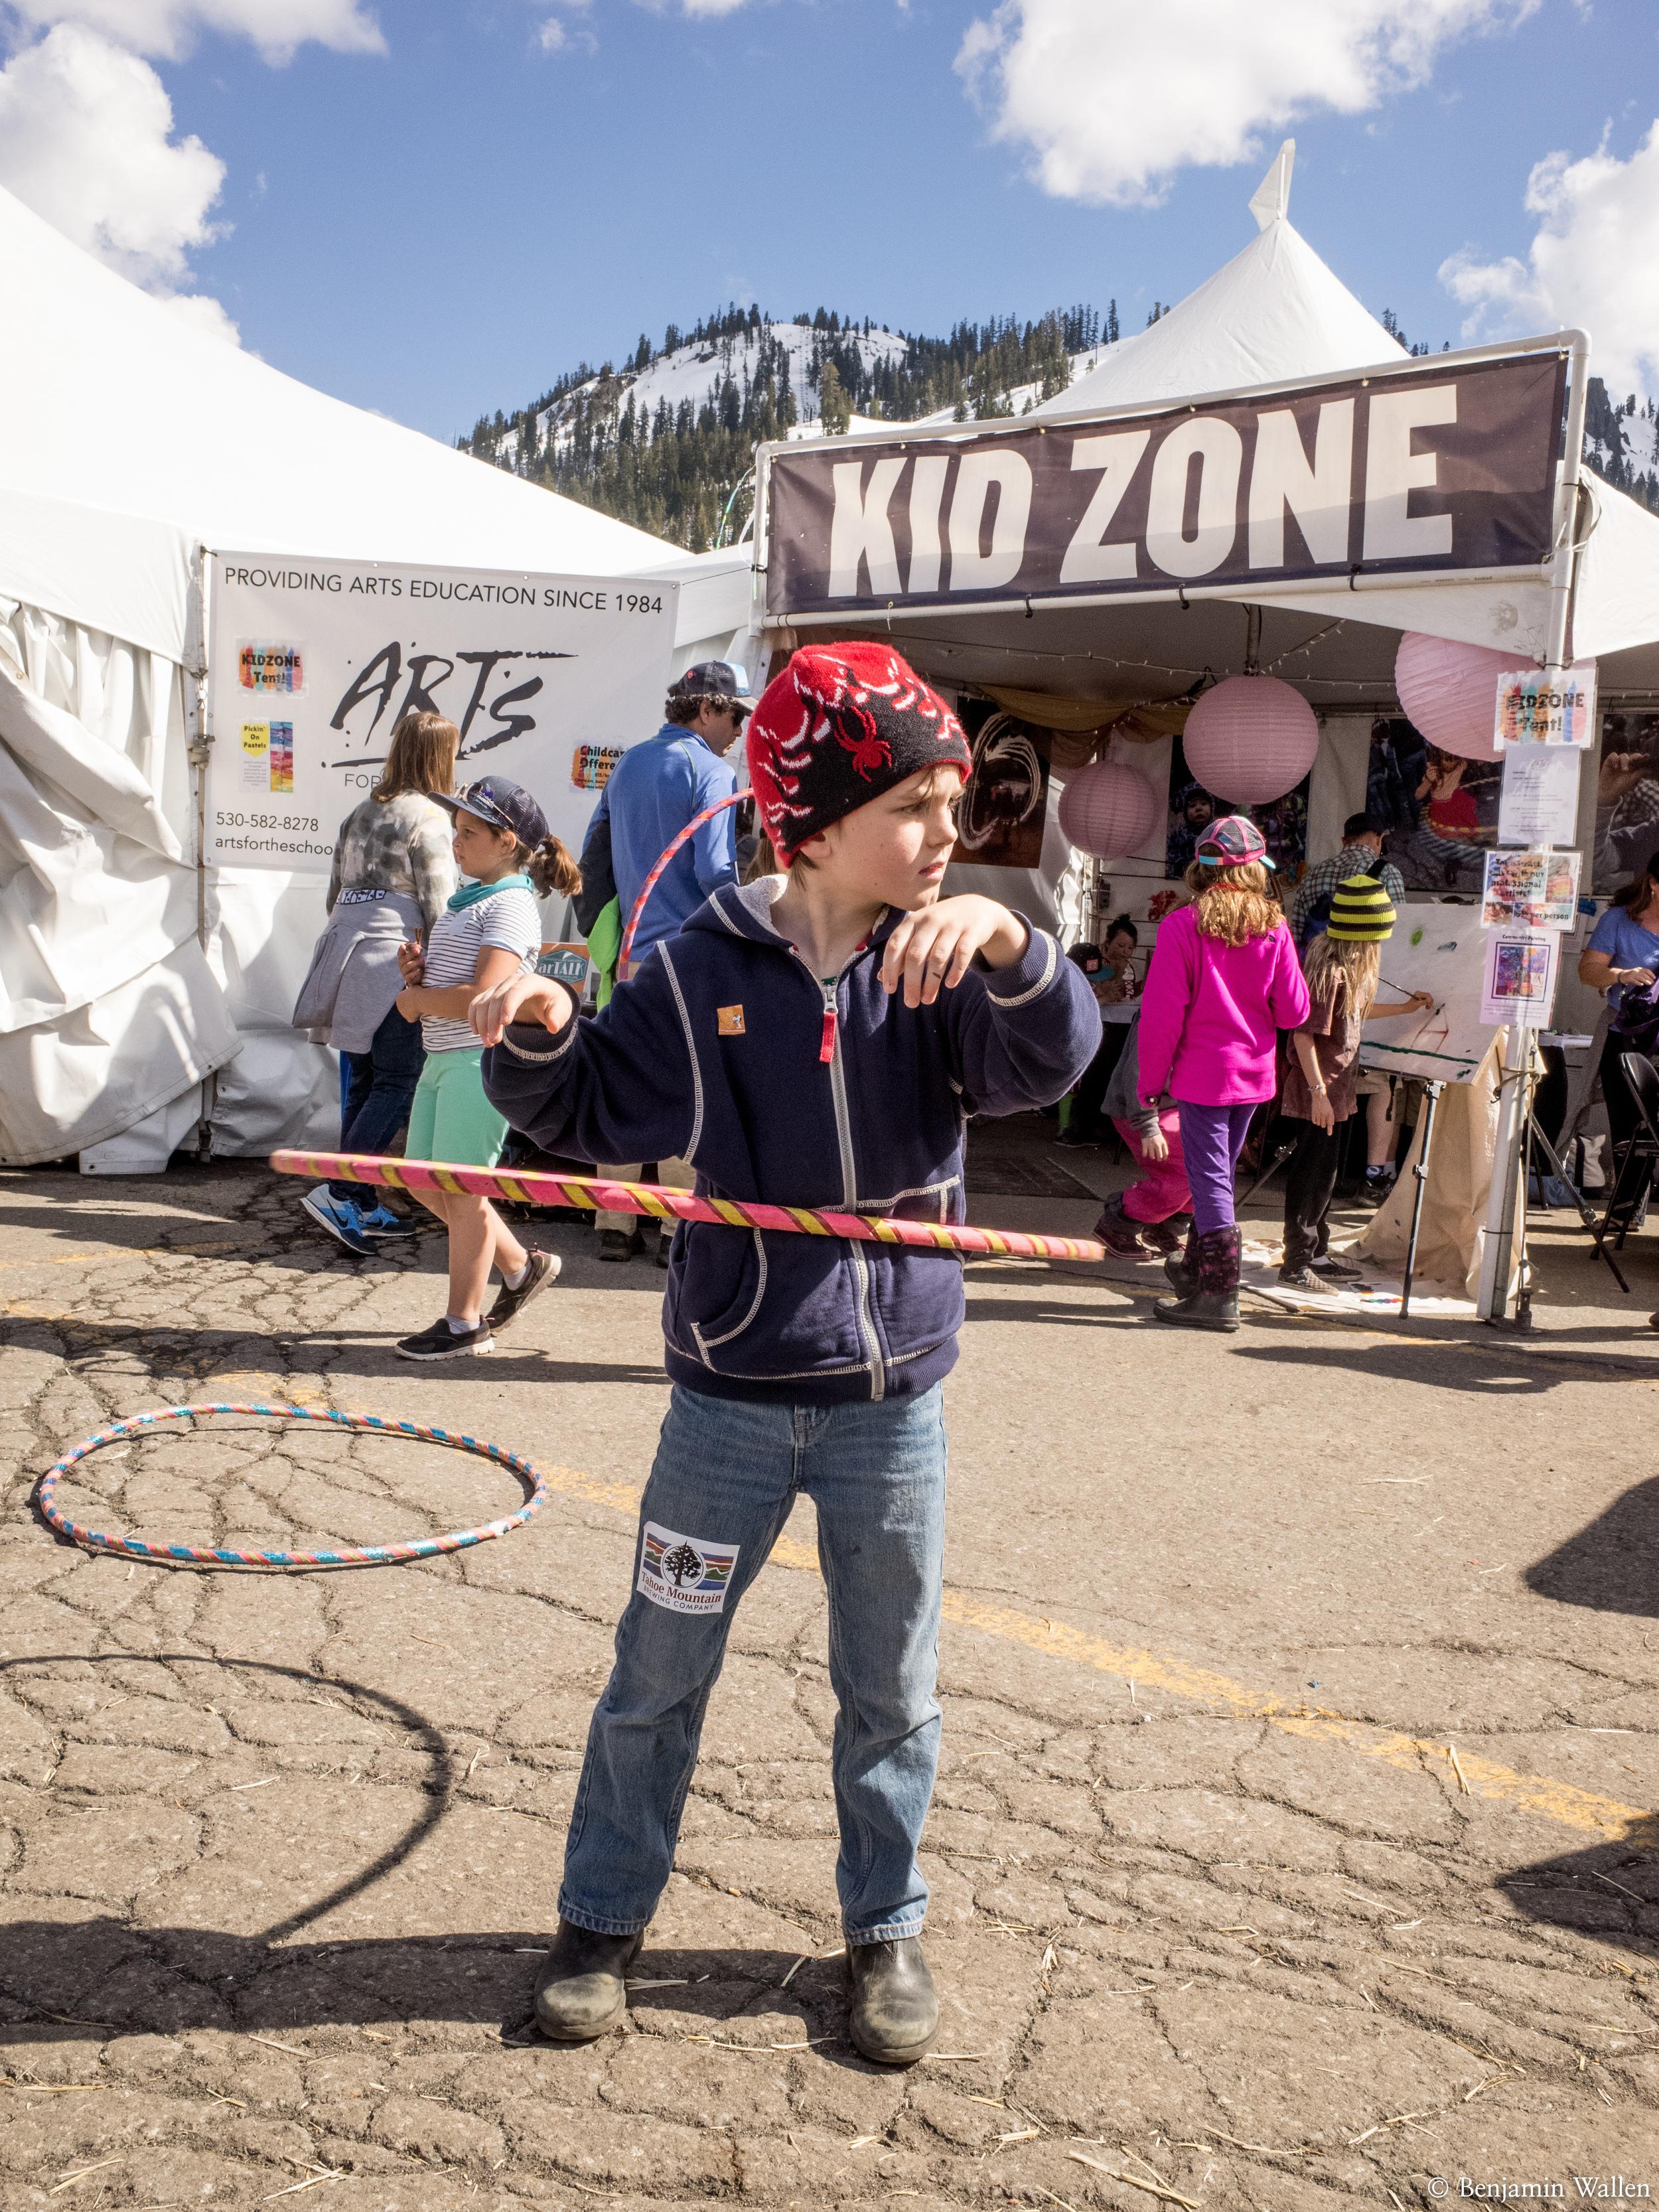 Super kid friendly festival, I love it.